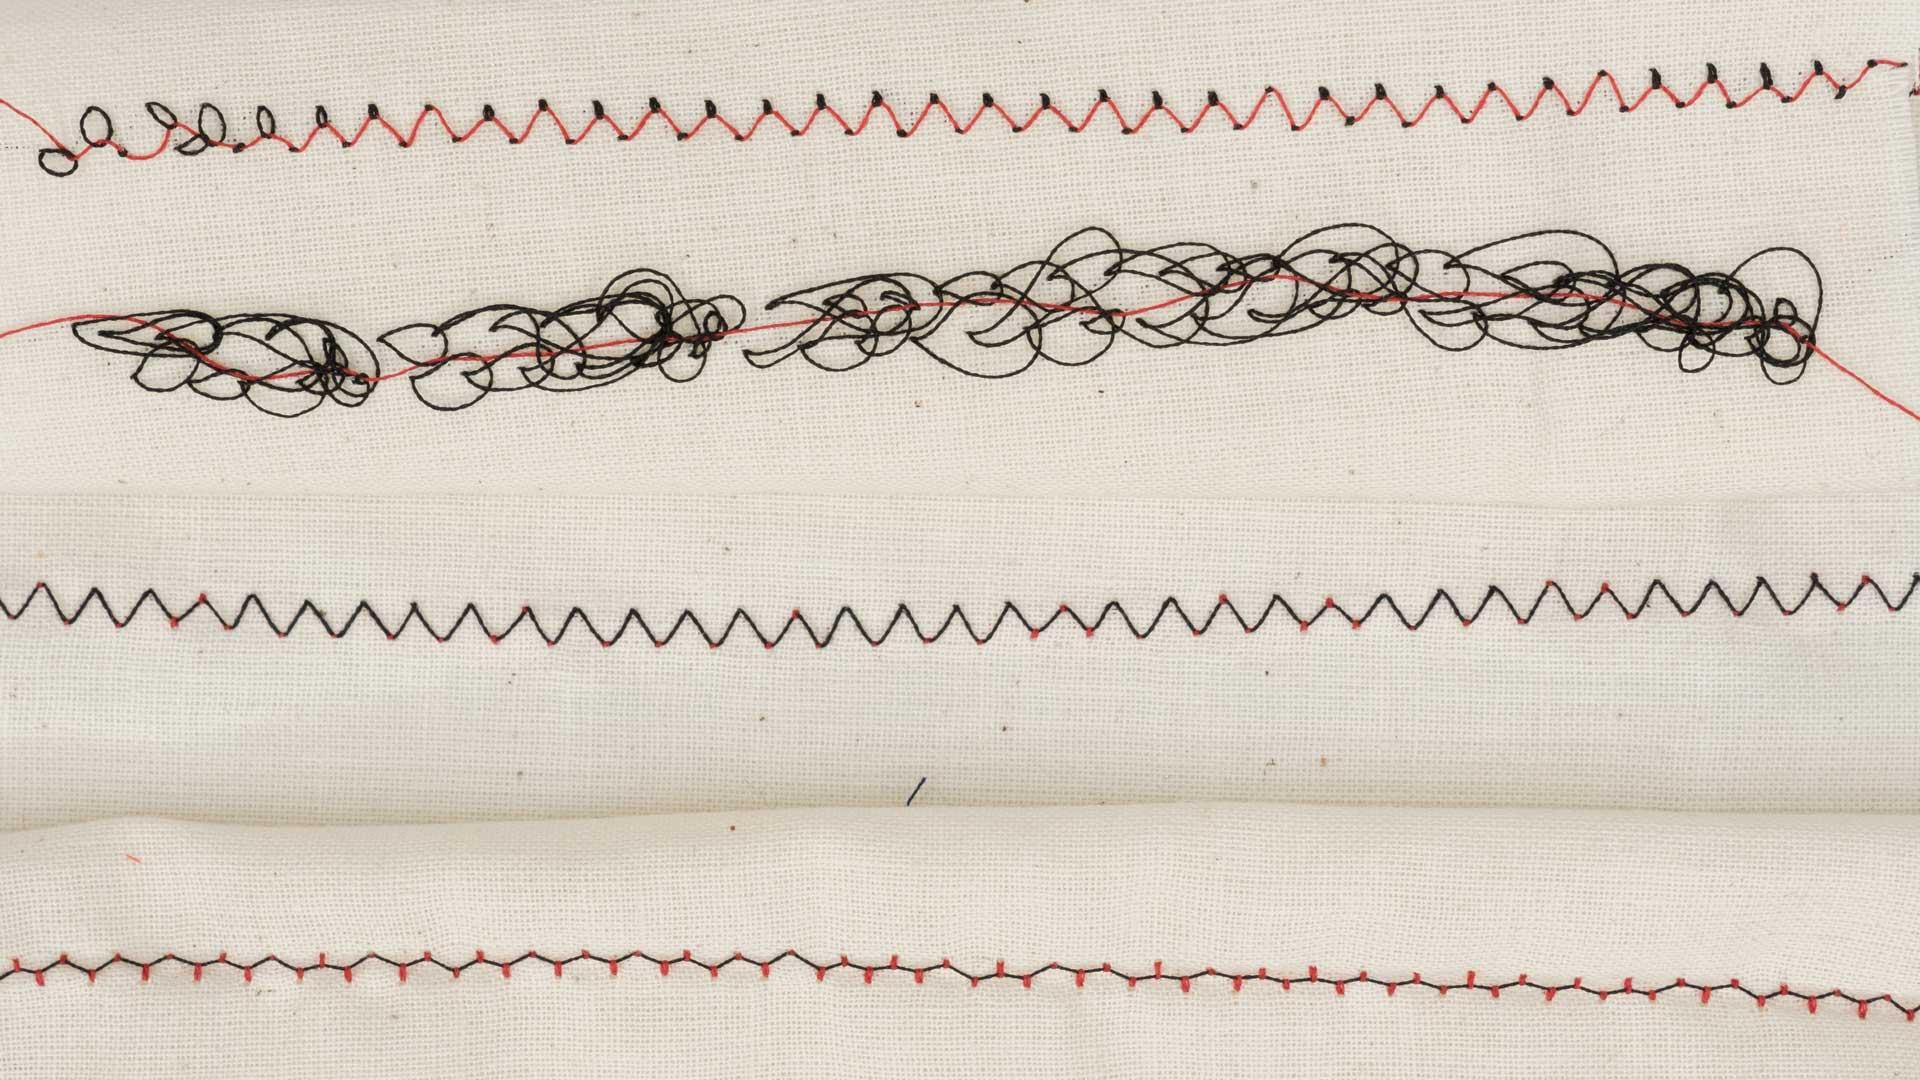 Sewing machine bottom thread too loose